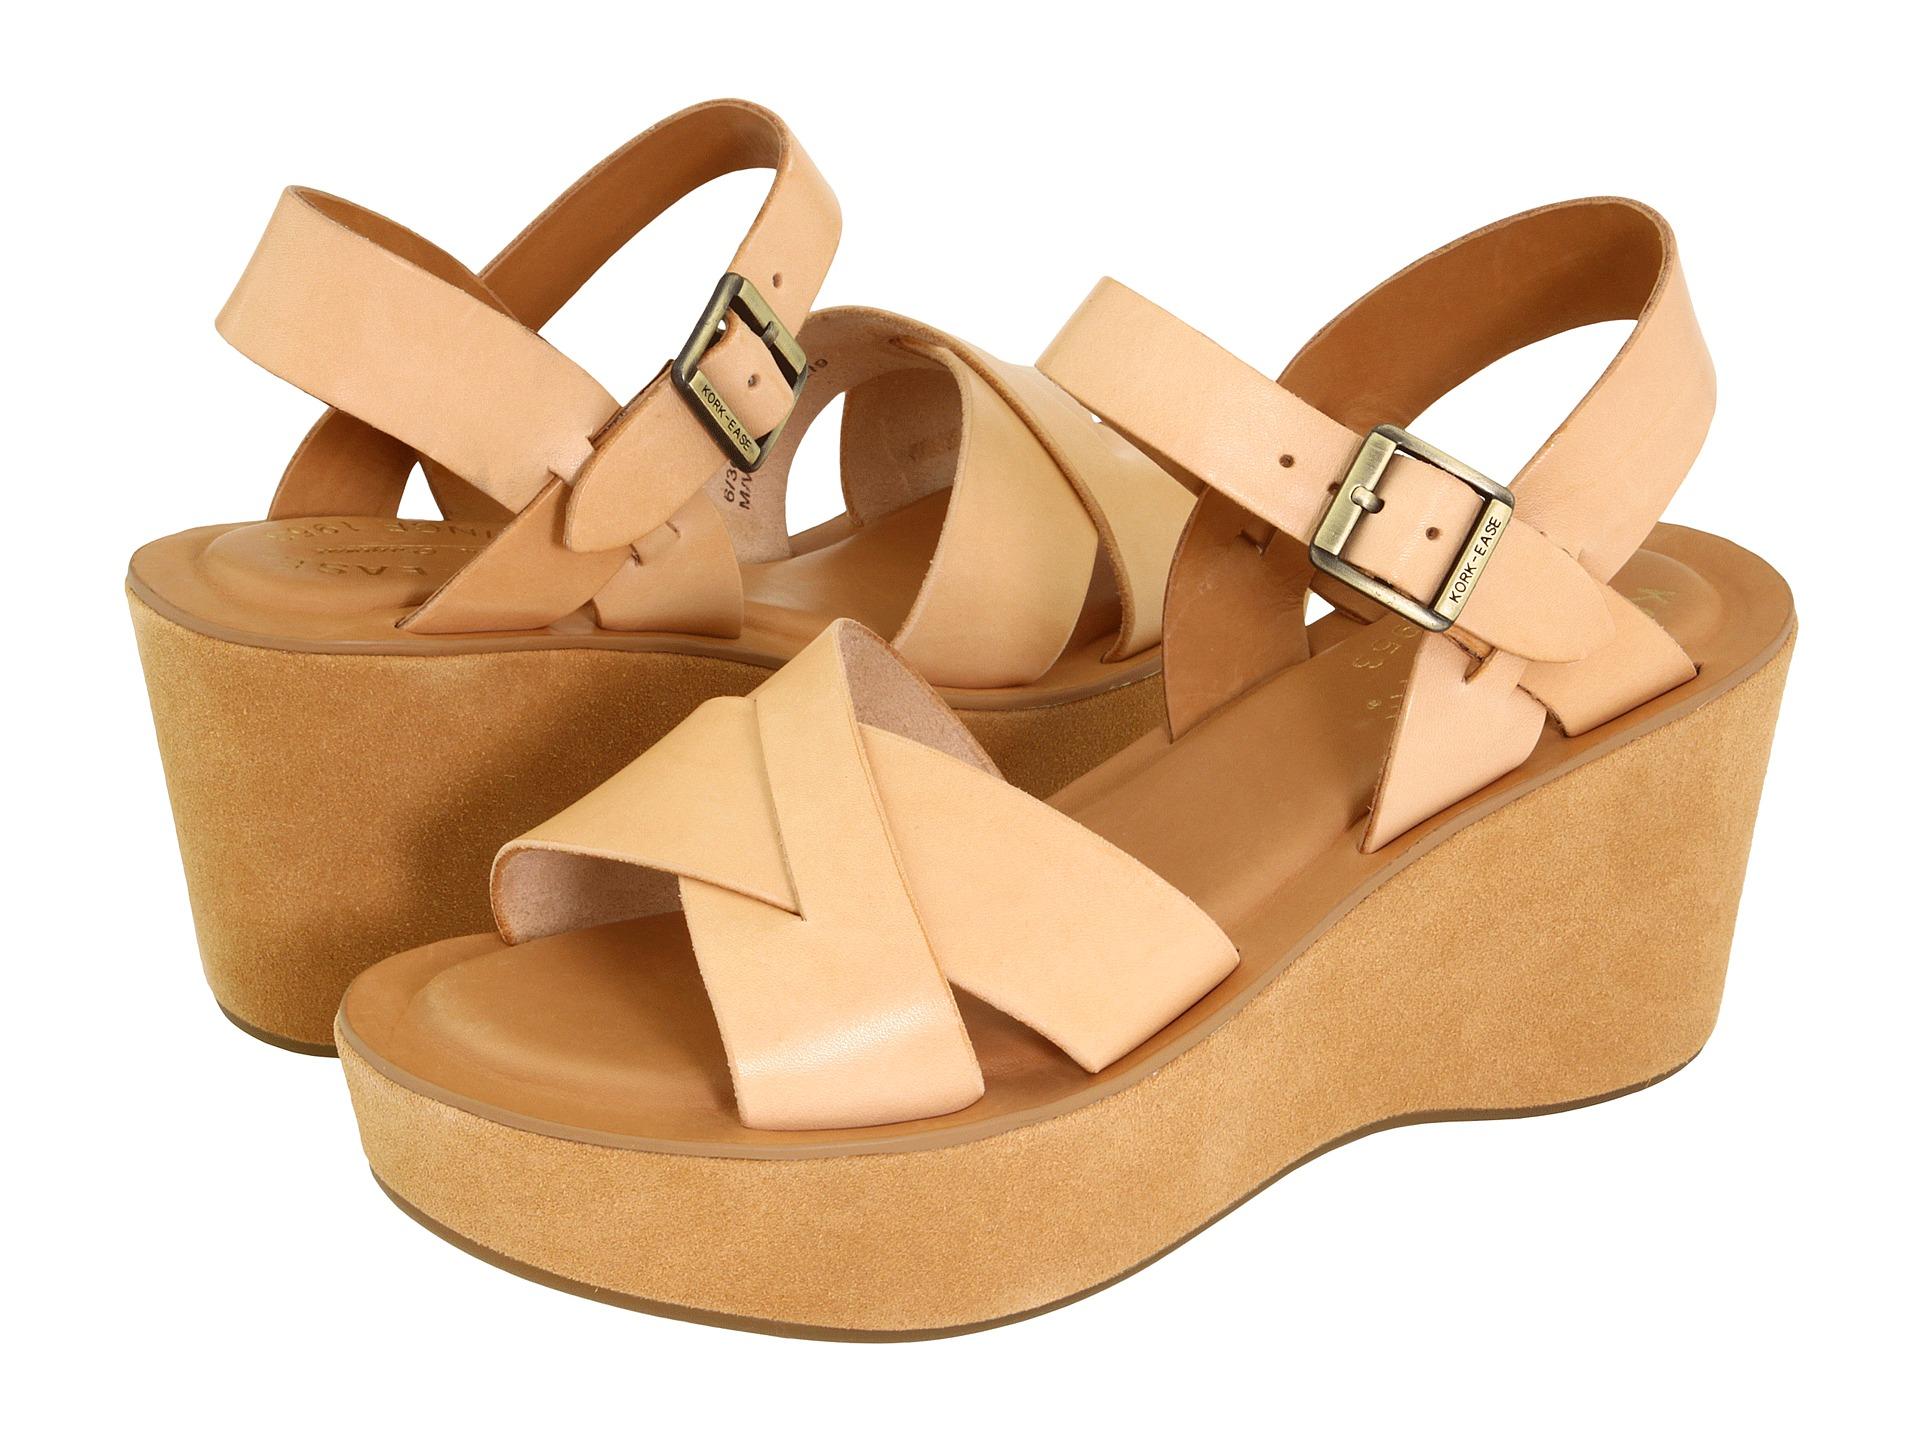 Kork Ease Shoes Reviews